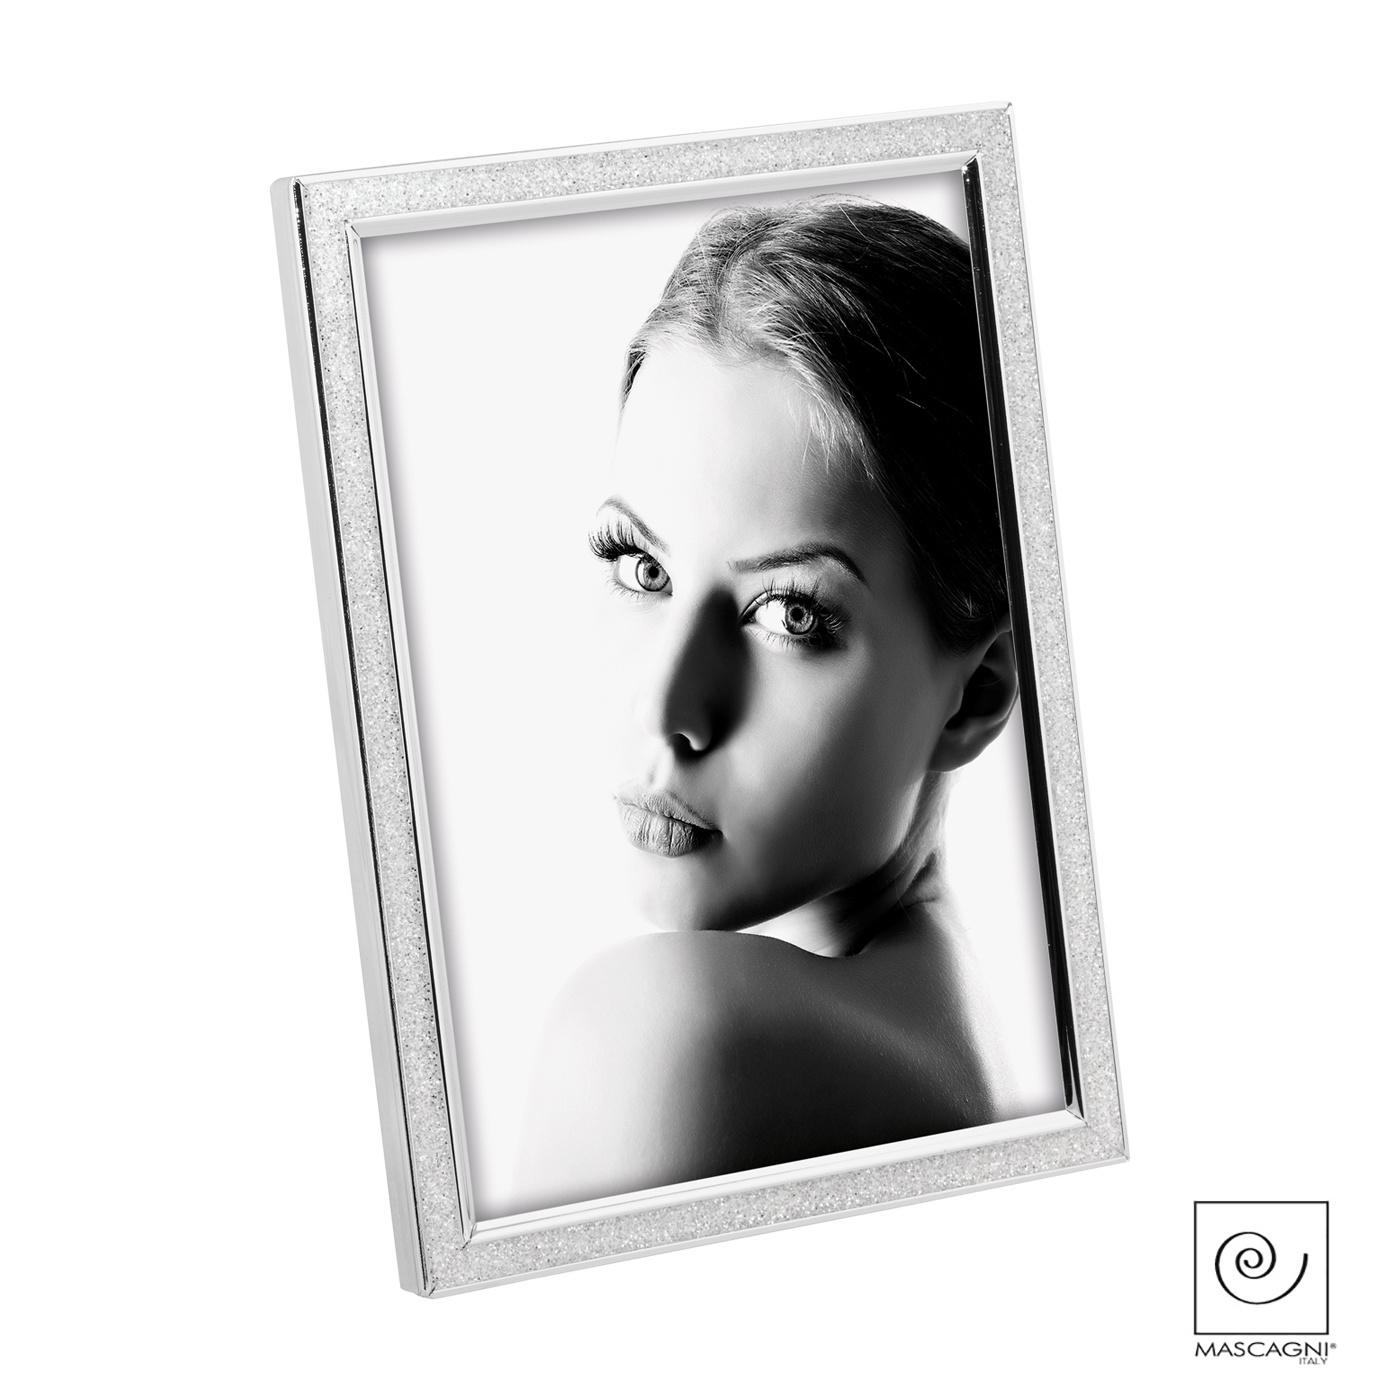 Art Mascagni A1066 PHOTO FRAME 15X20 - COL.SILVER